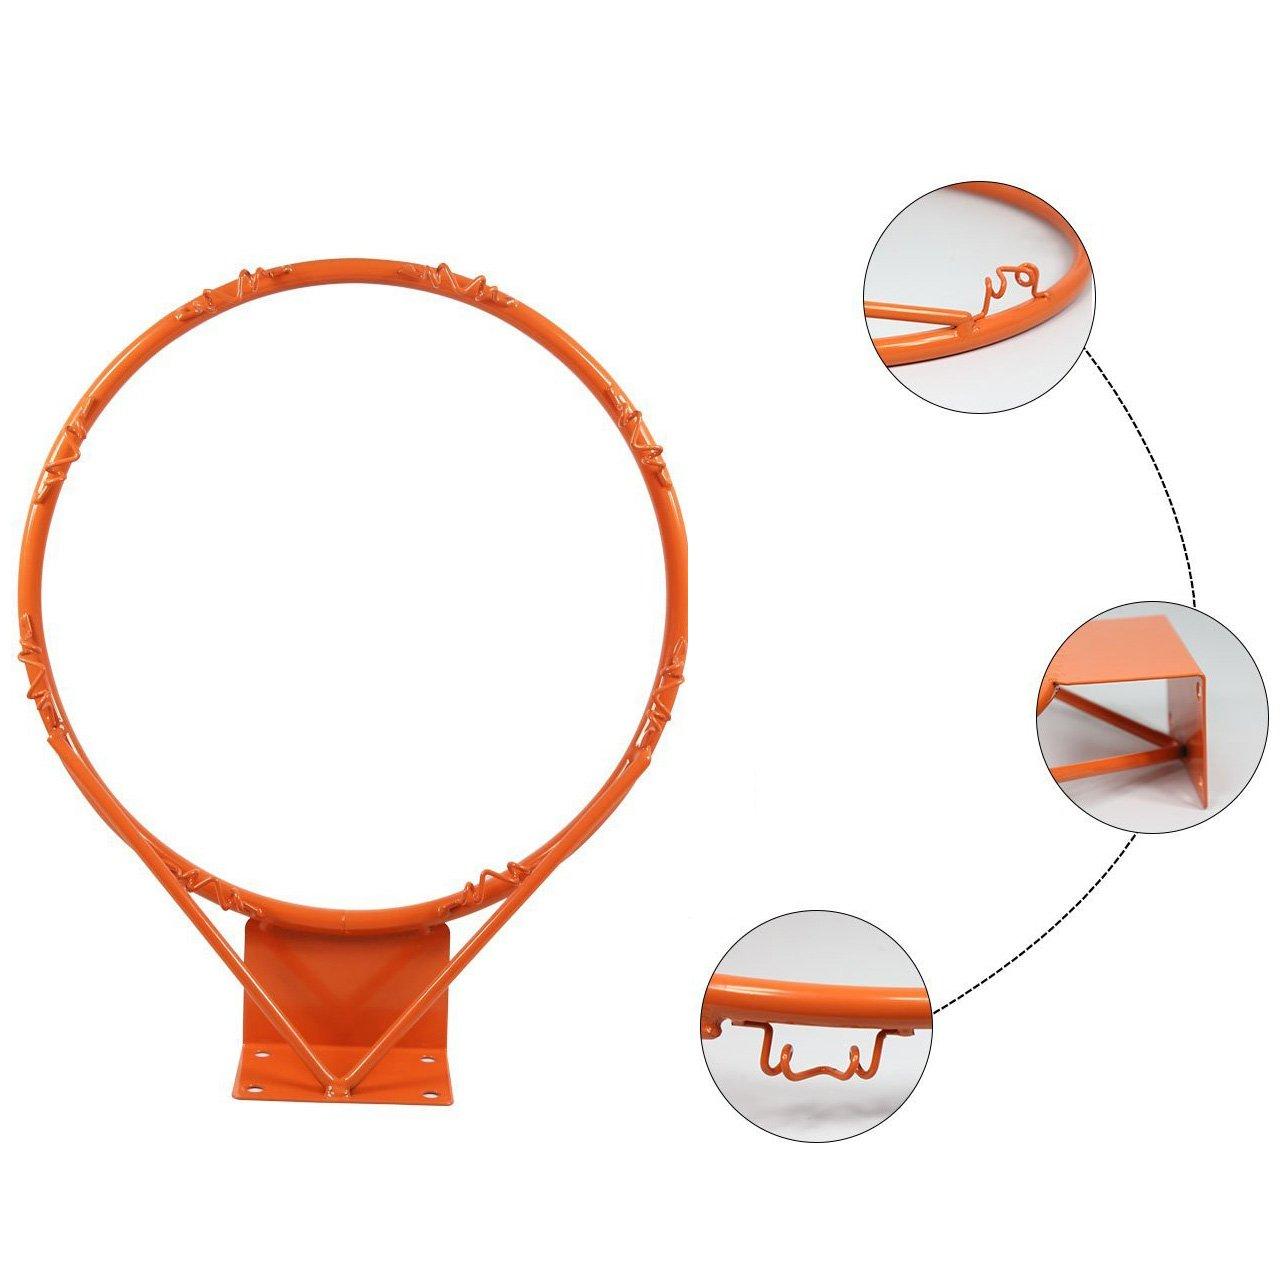 Amazon.com: Aro de baloncesto para niños de Dream ...